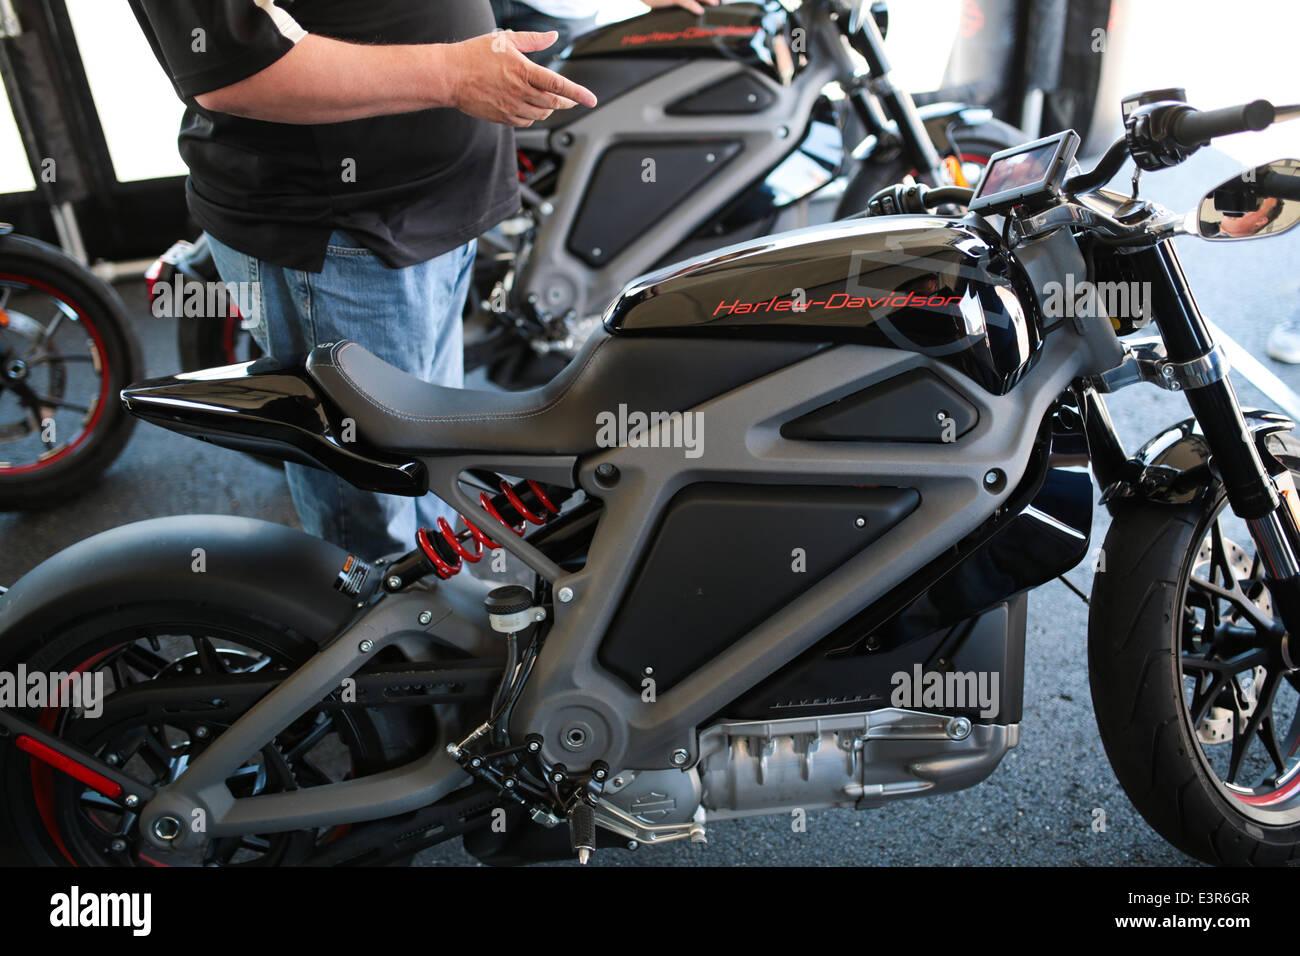 Großartig Harley Davidson Live Draht Elektro Motorrad Bilder ...